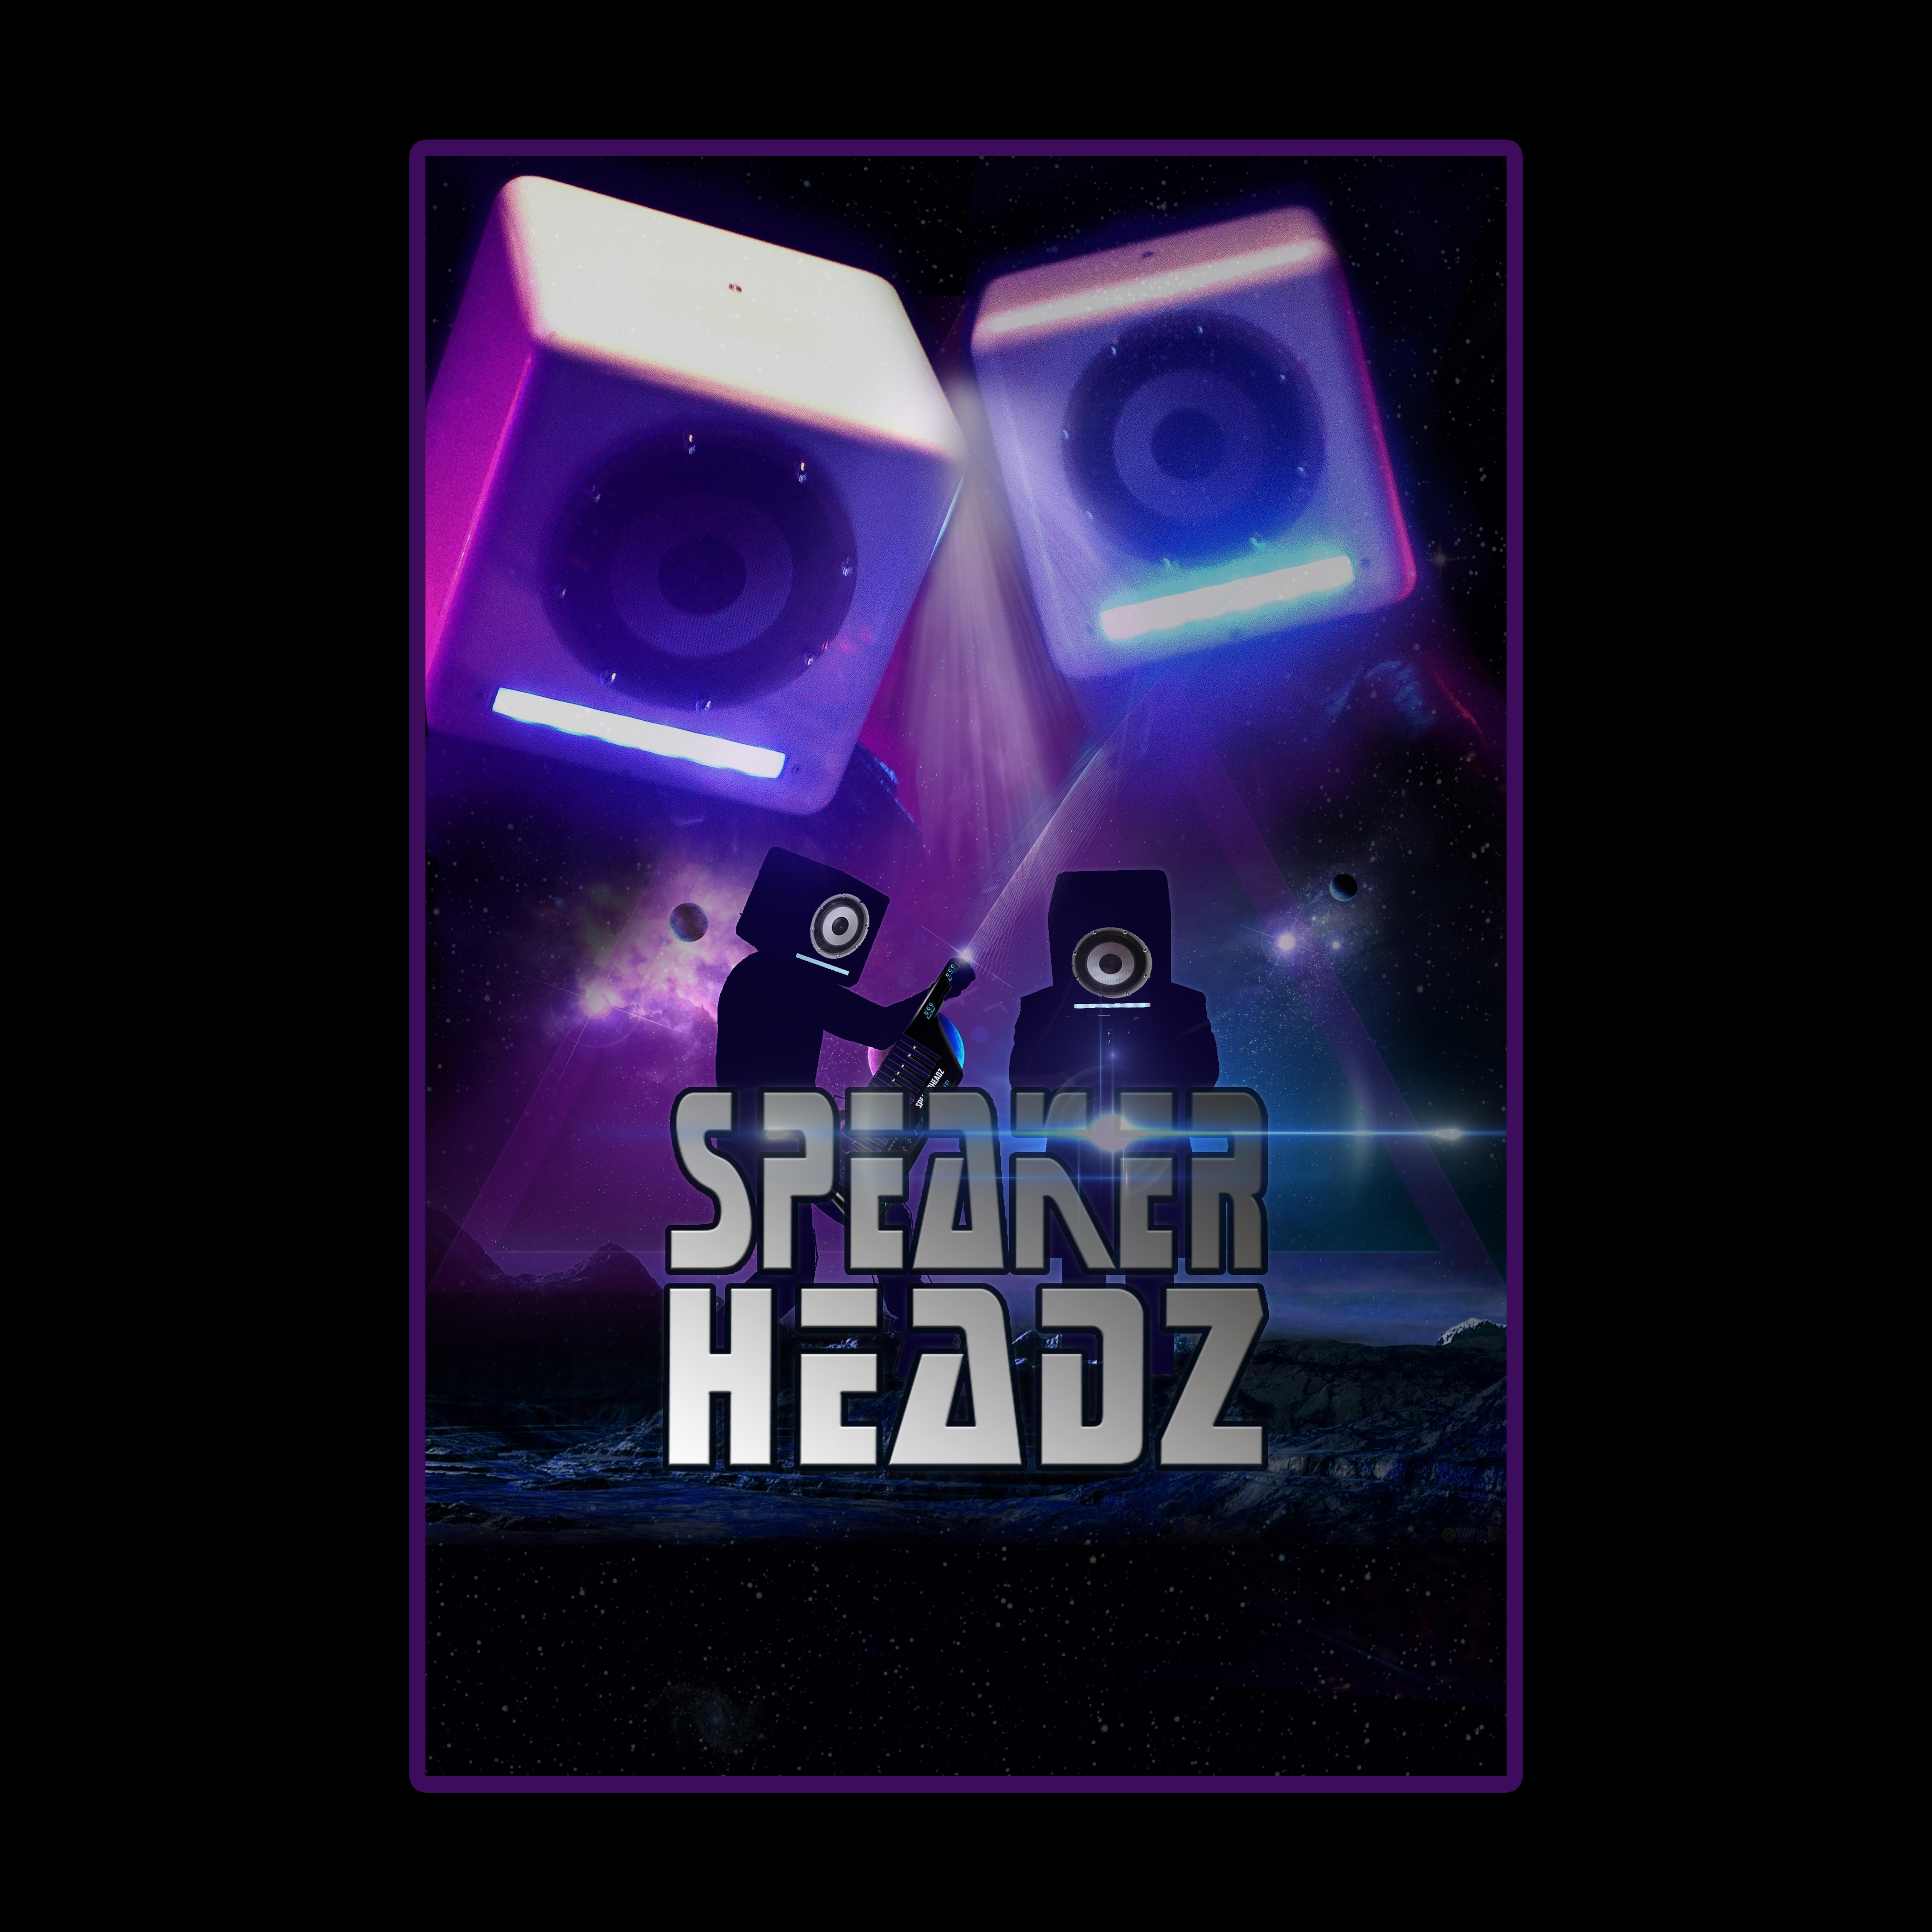 space-speakerheadz-flyer